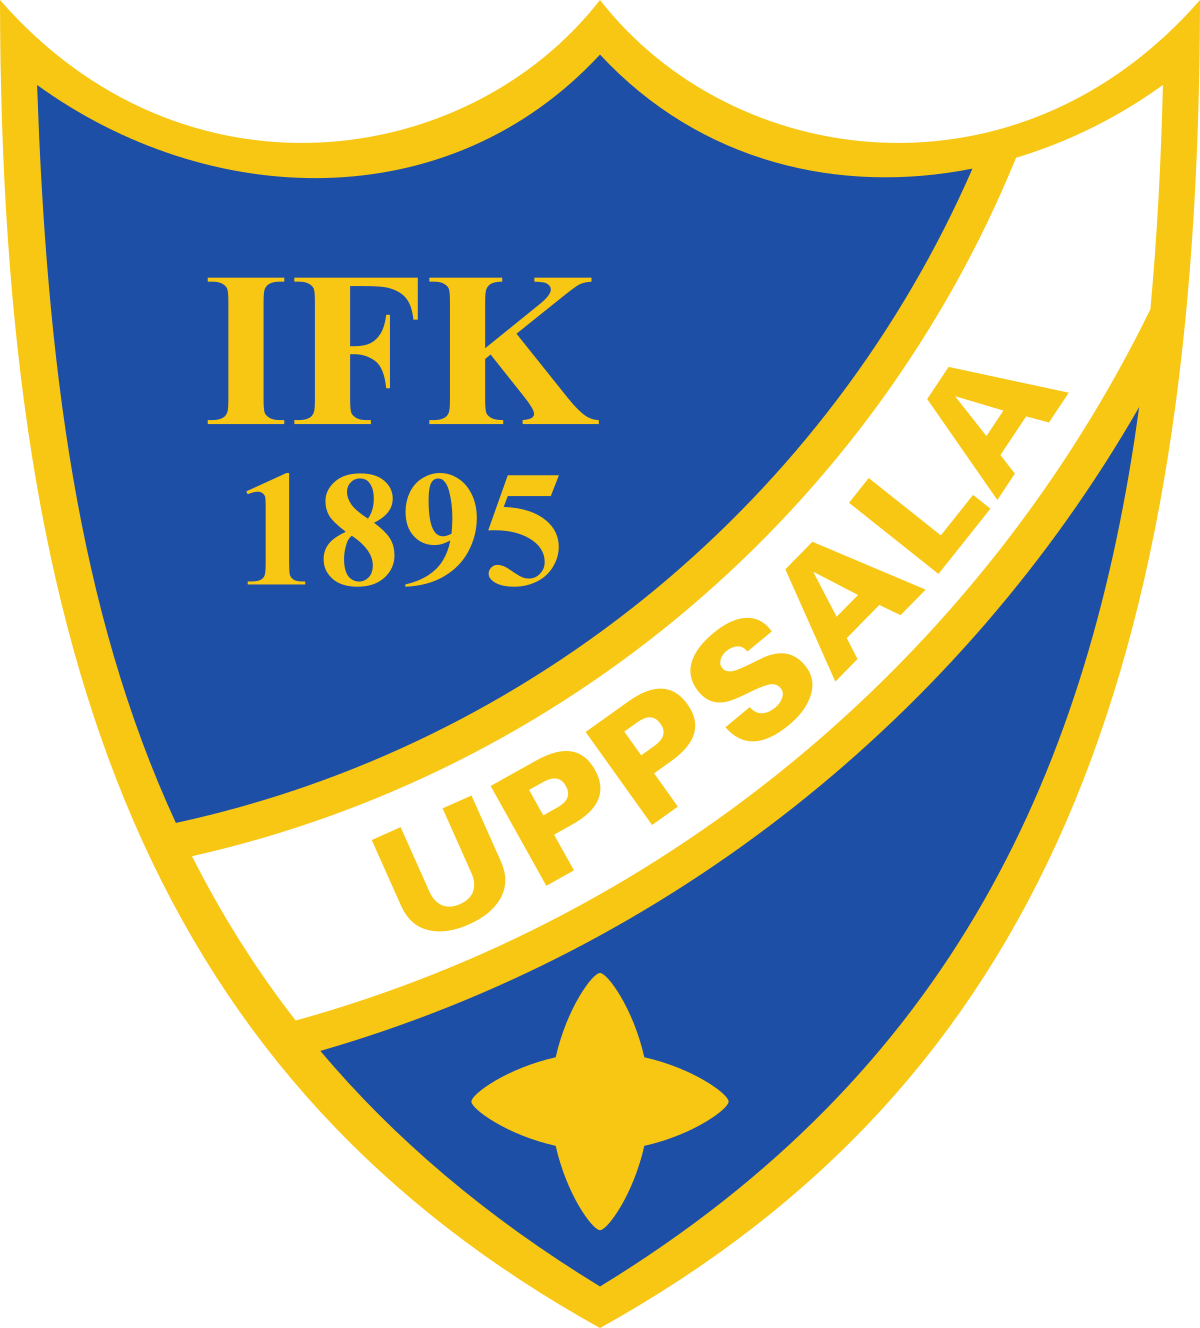 IFK Uppsala